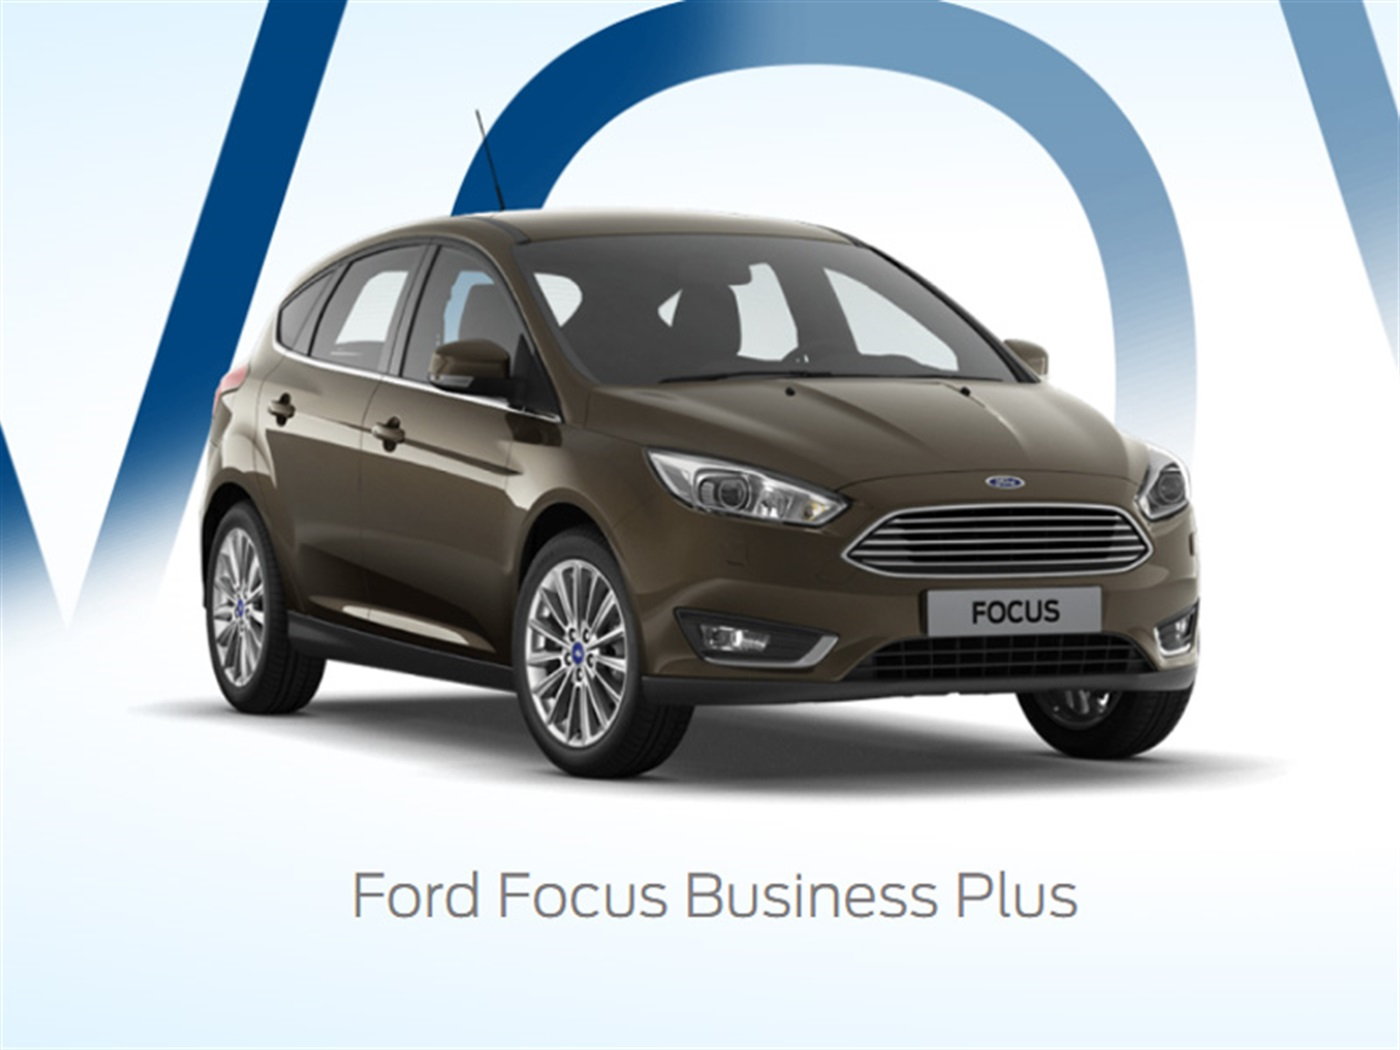 Ford Focus Business PLUS